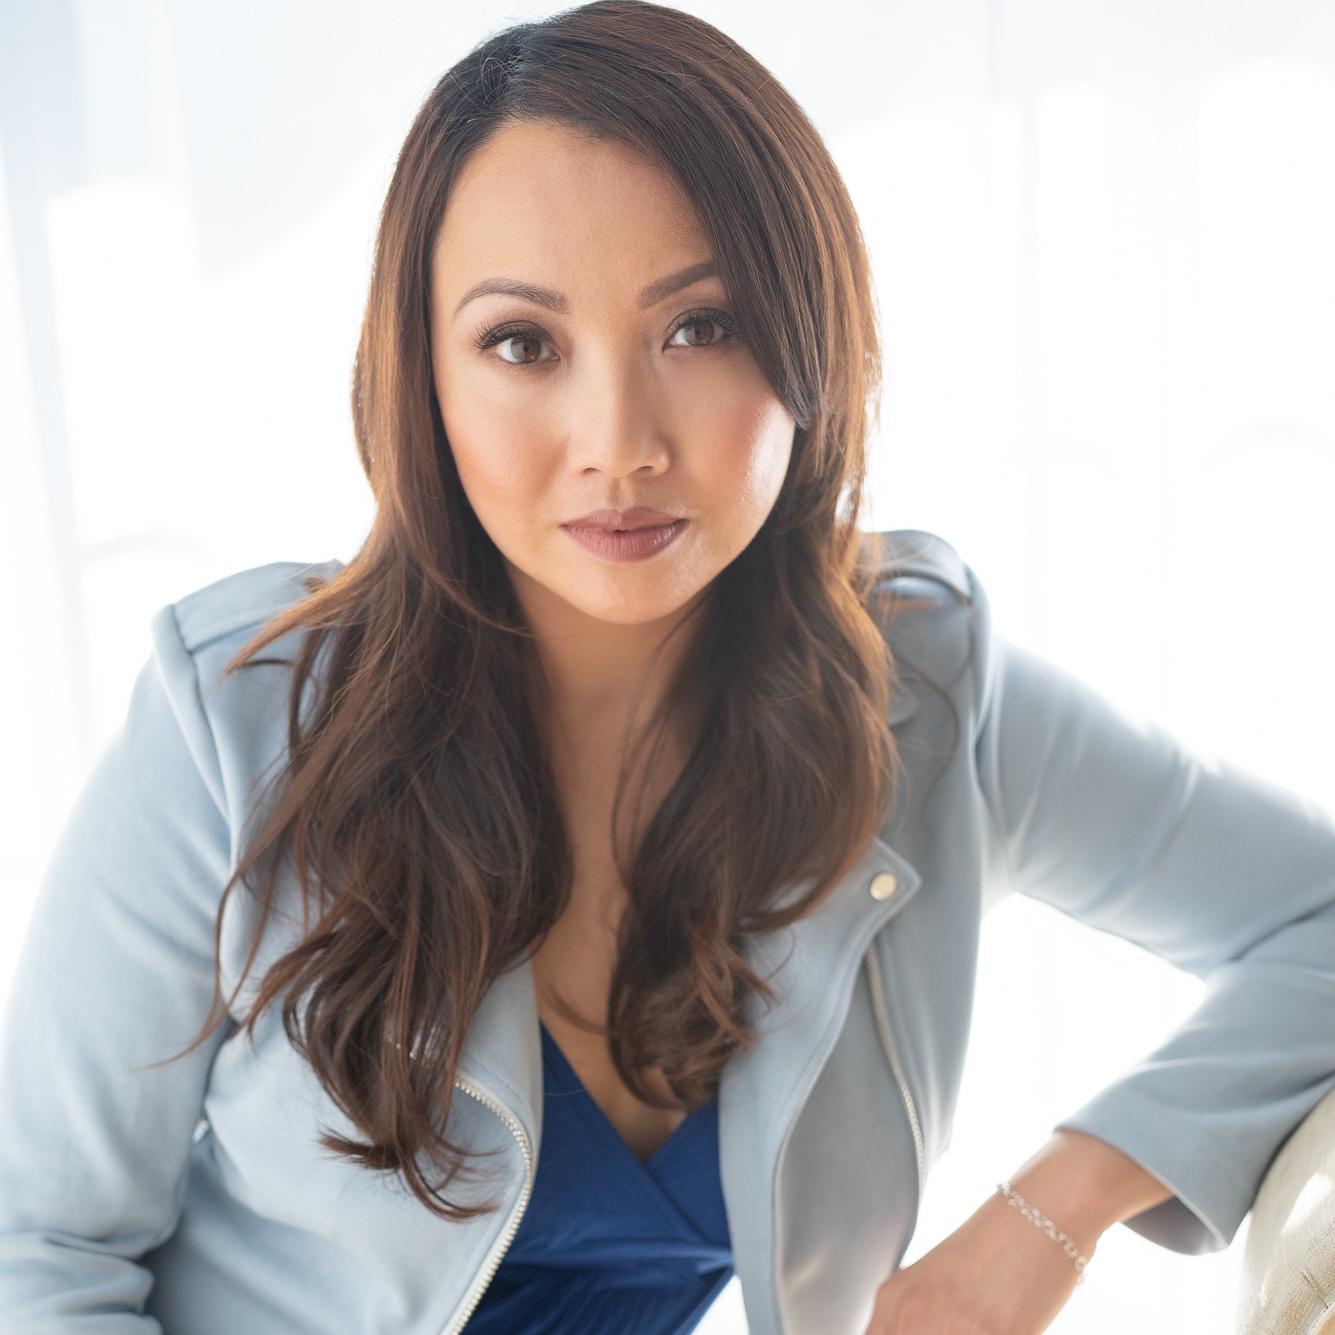 Tess Hau, Venture Capitalist and Blockchain Advisor